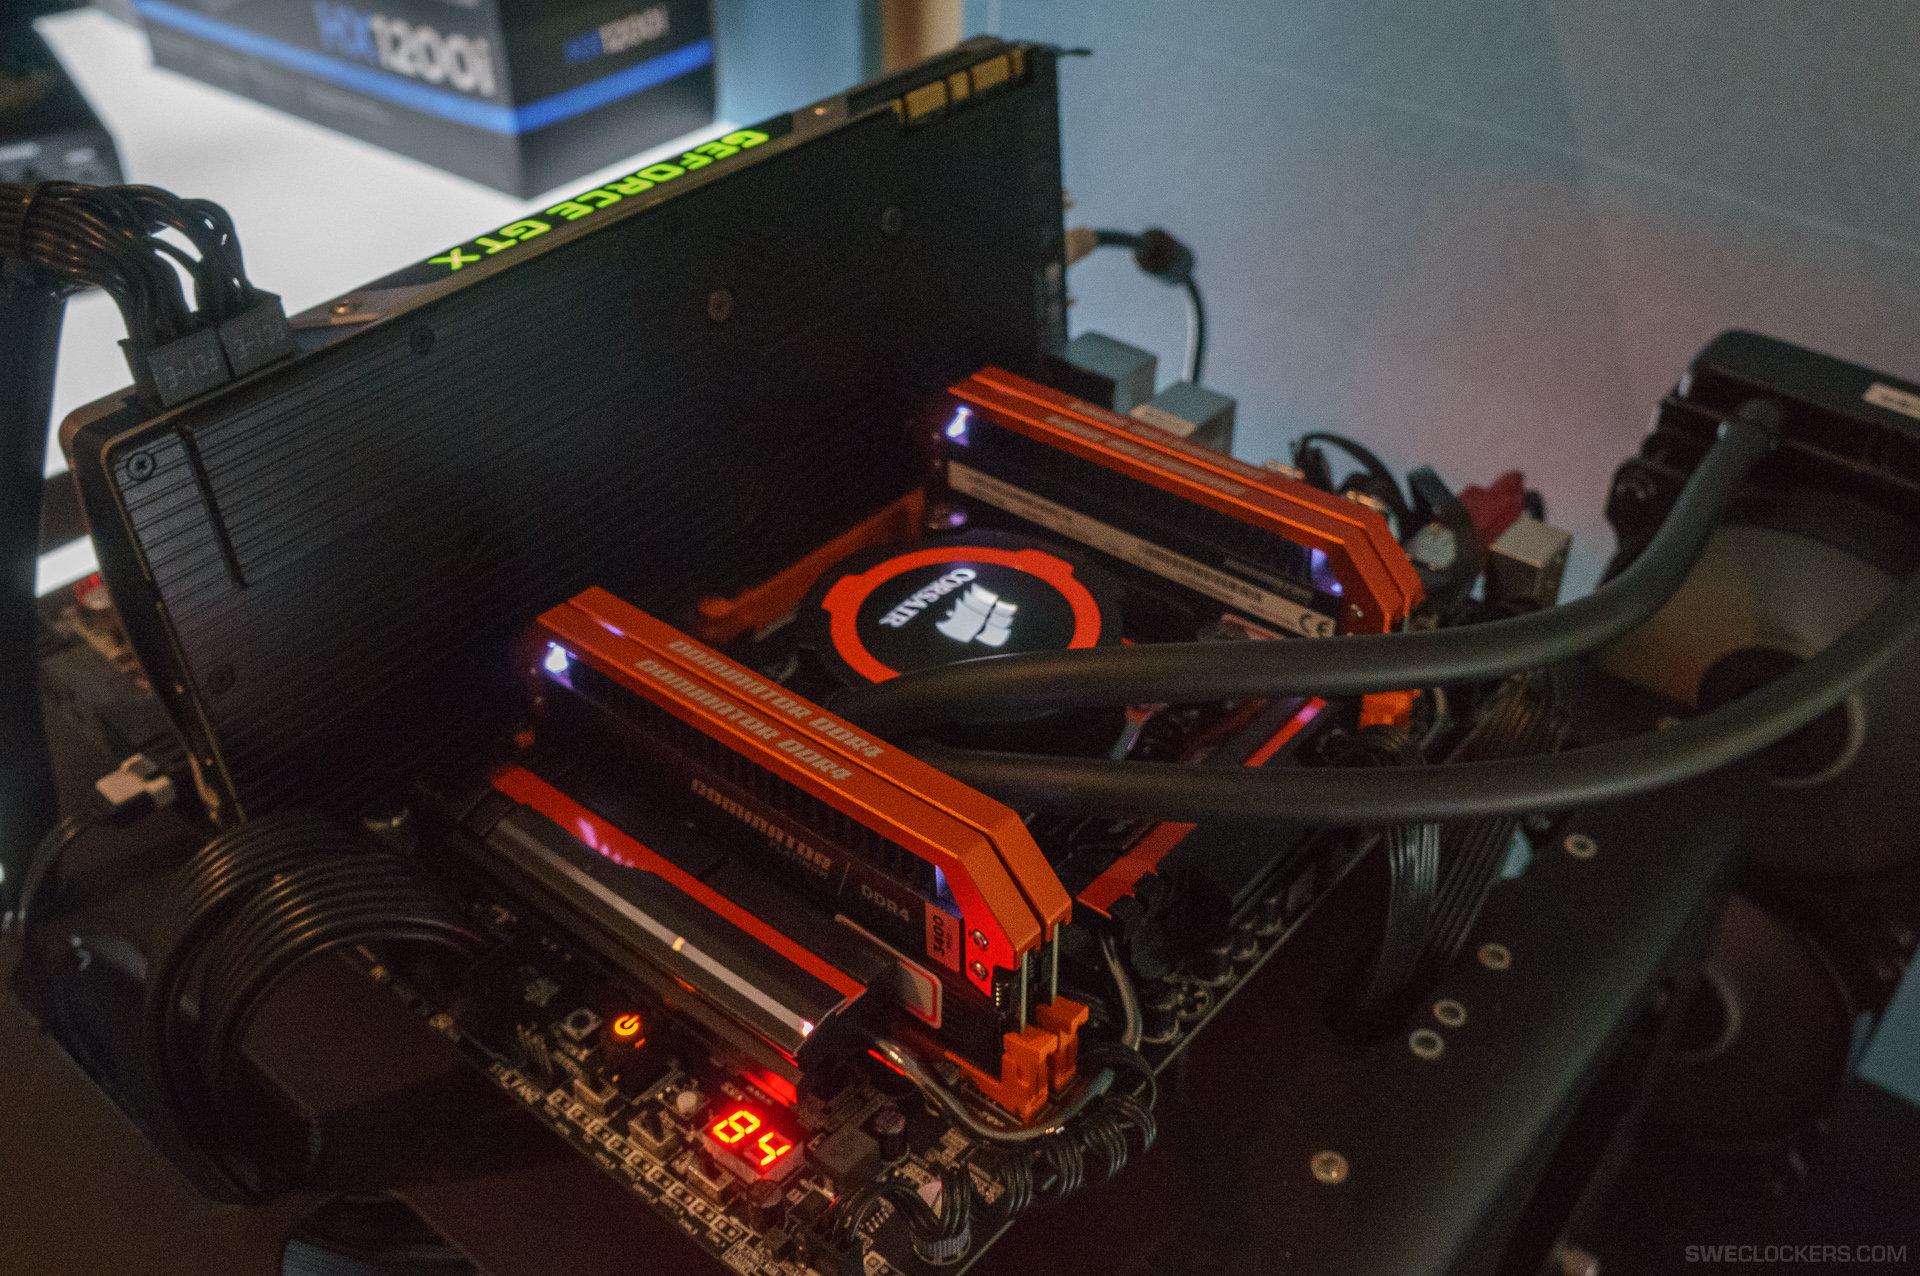 Corsair Dominator Platinum DDR4 + Gigabyte X99-SOC Champion